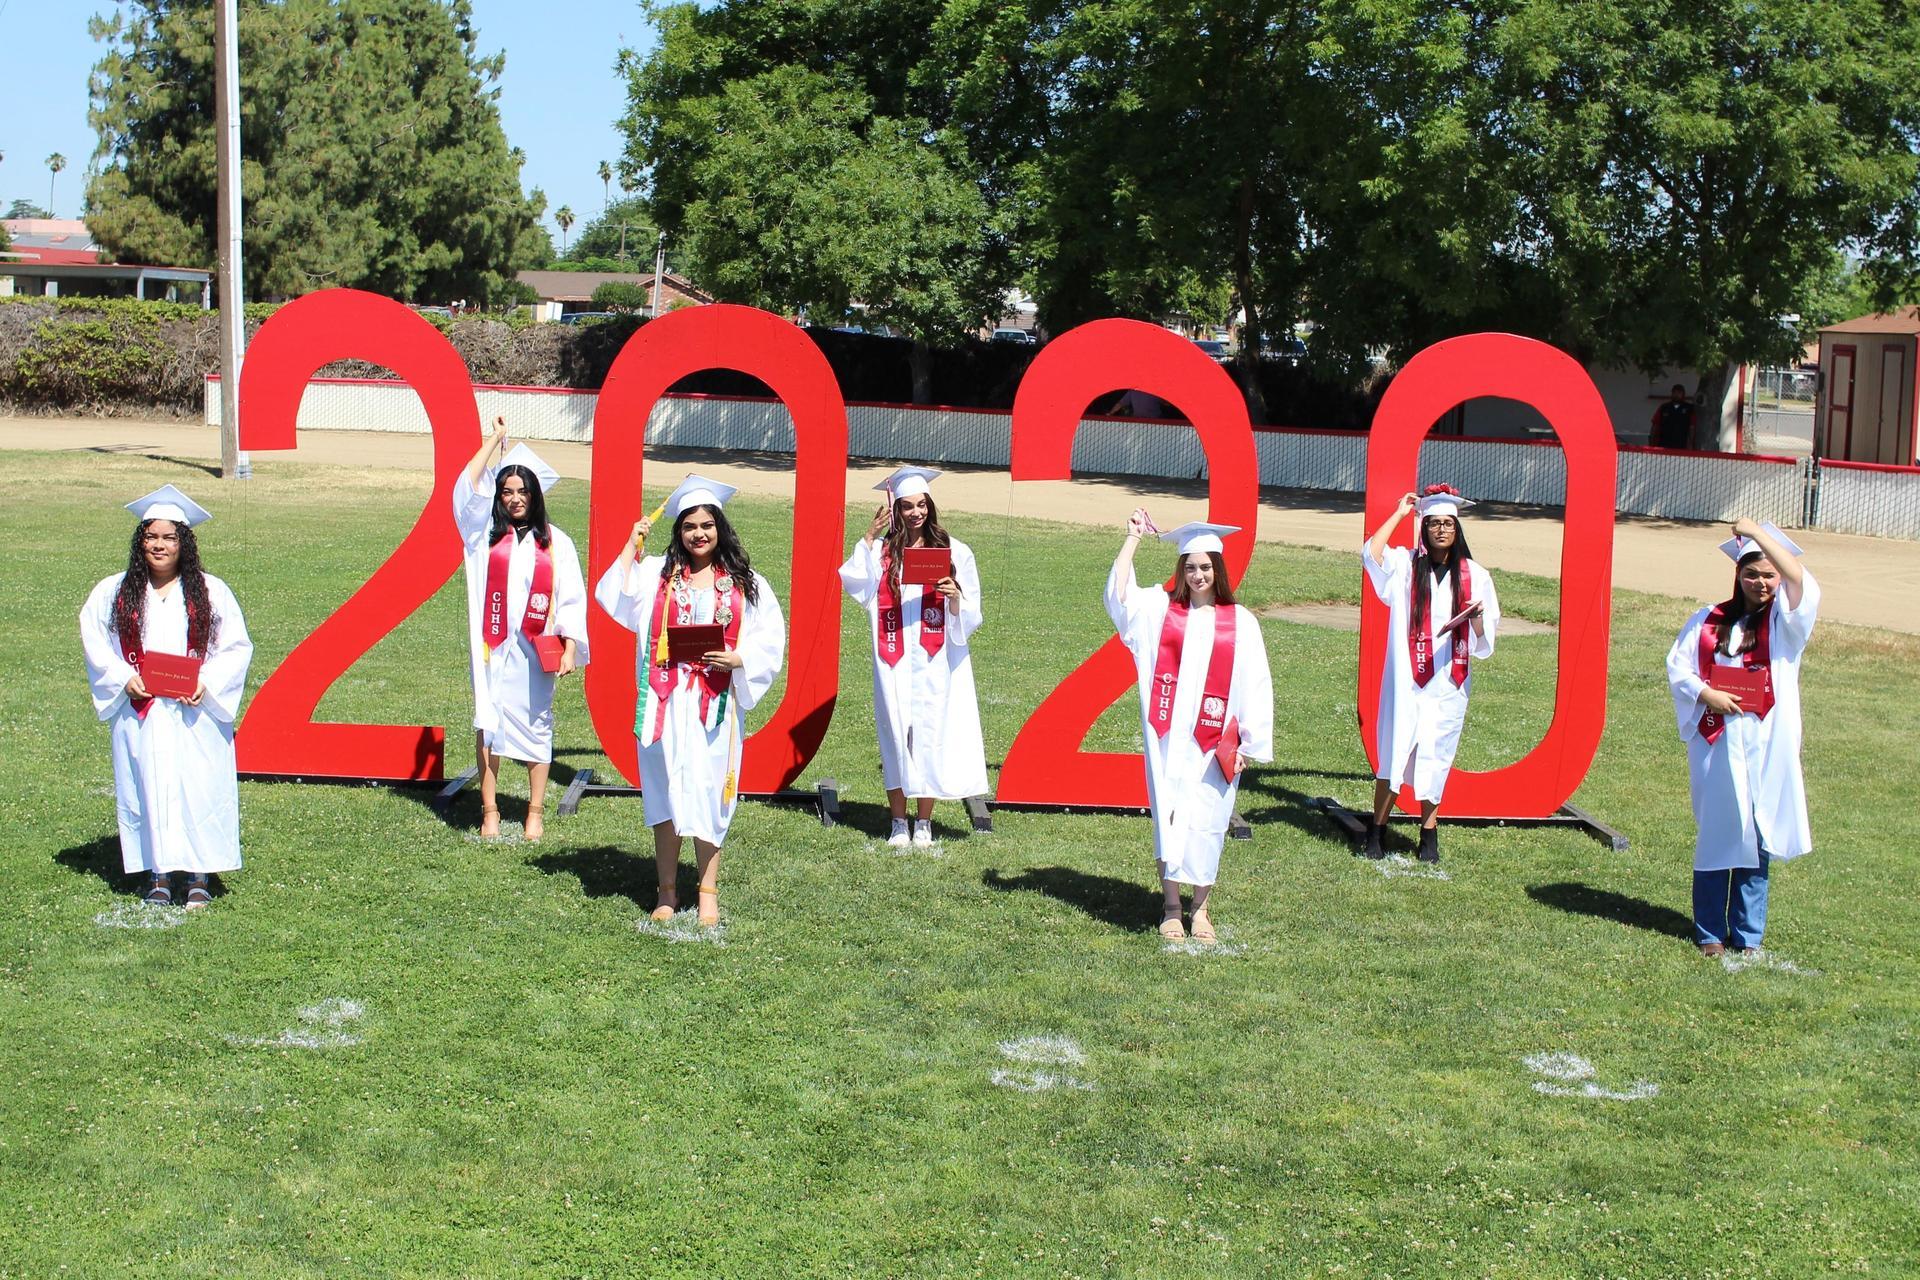 Left to right, Vanessa Yuriar, Sandra Chavez, Jennifer Pelayo, Josephine Moore, Lillian Sandlin, Abhineet Singh, and Jessalyn Guardado turning their tassels